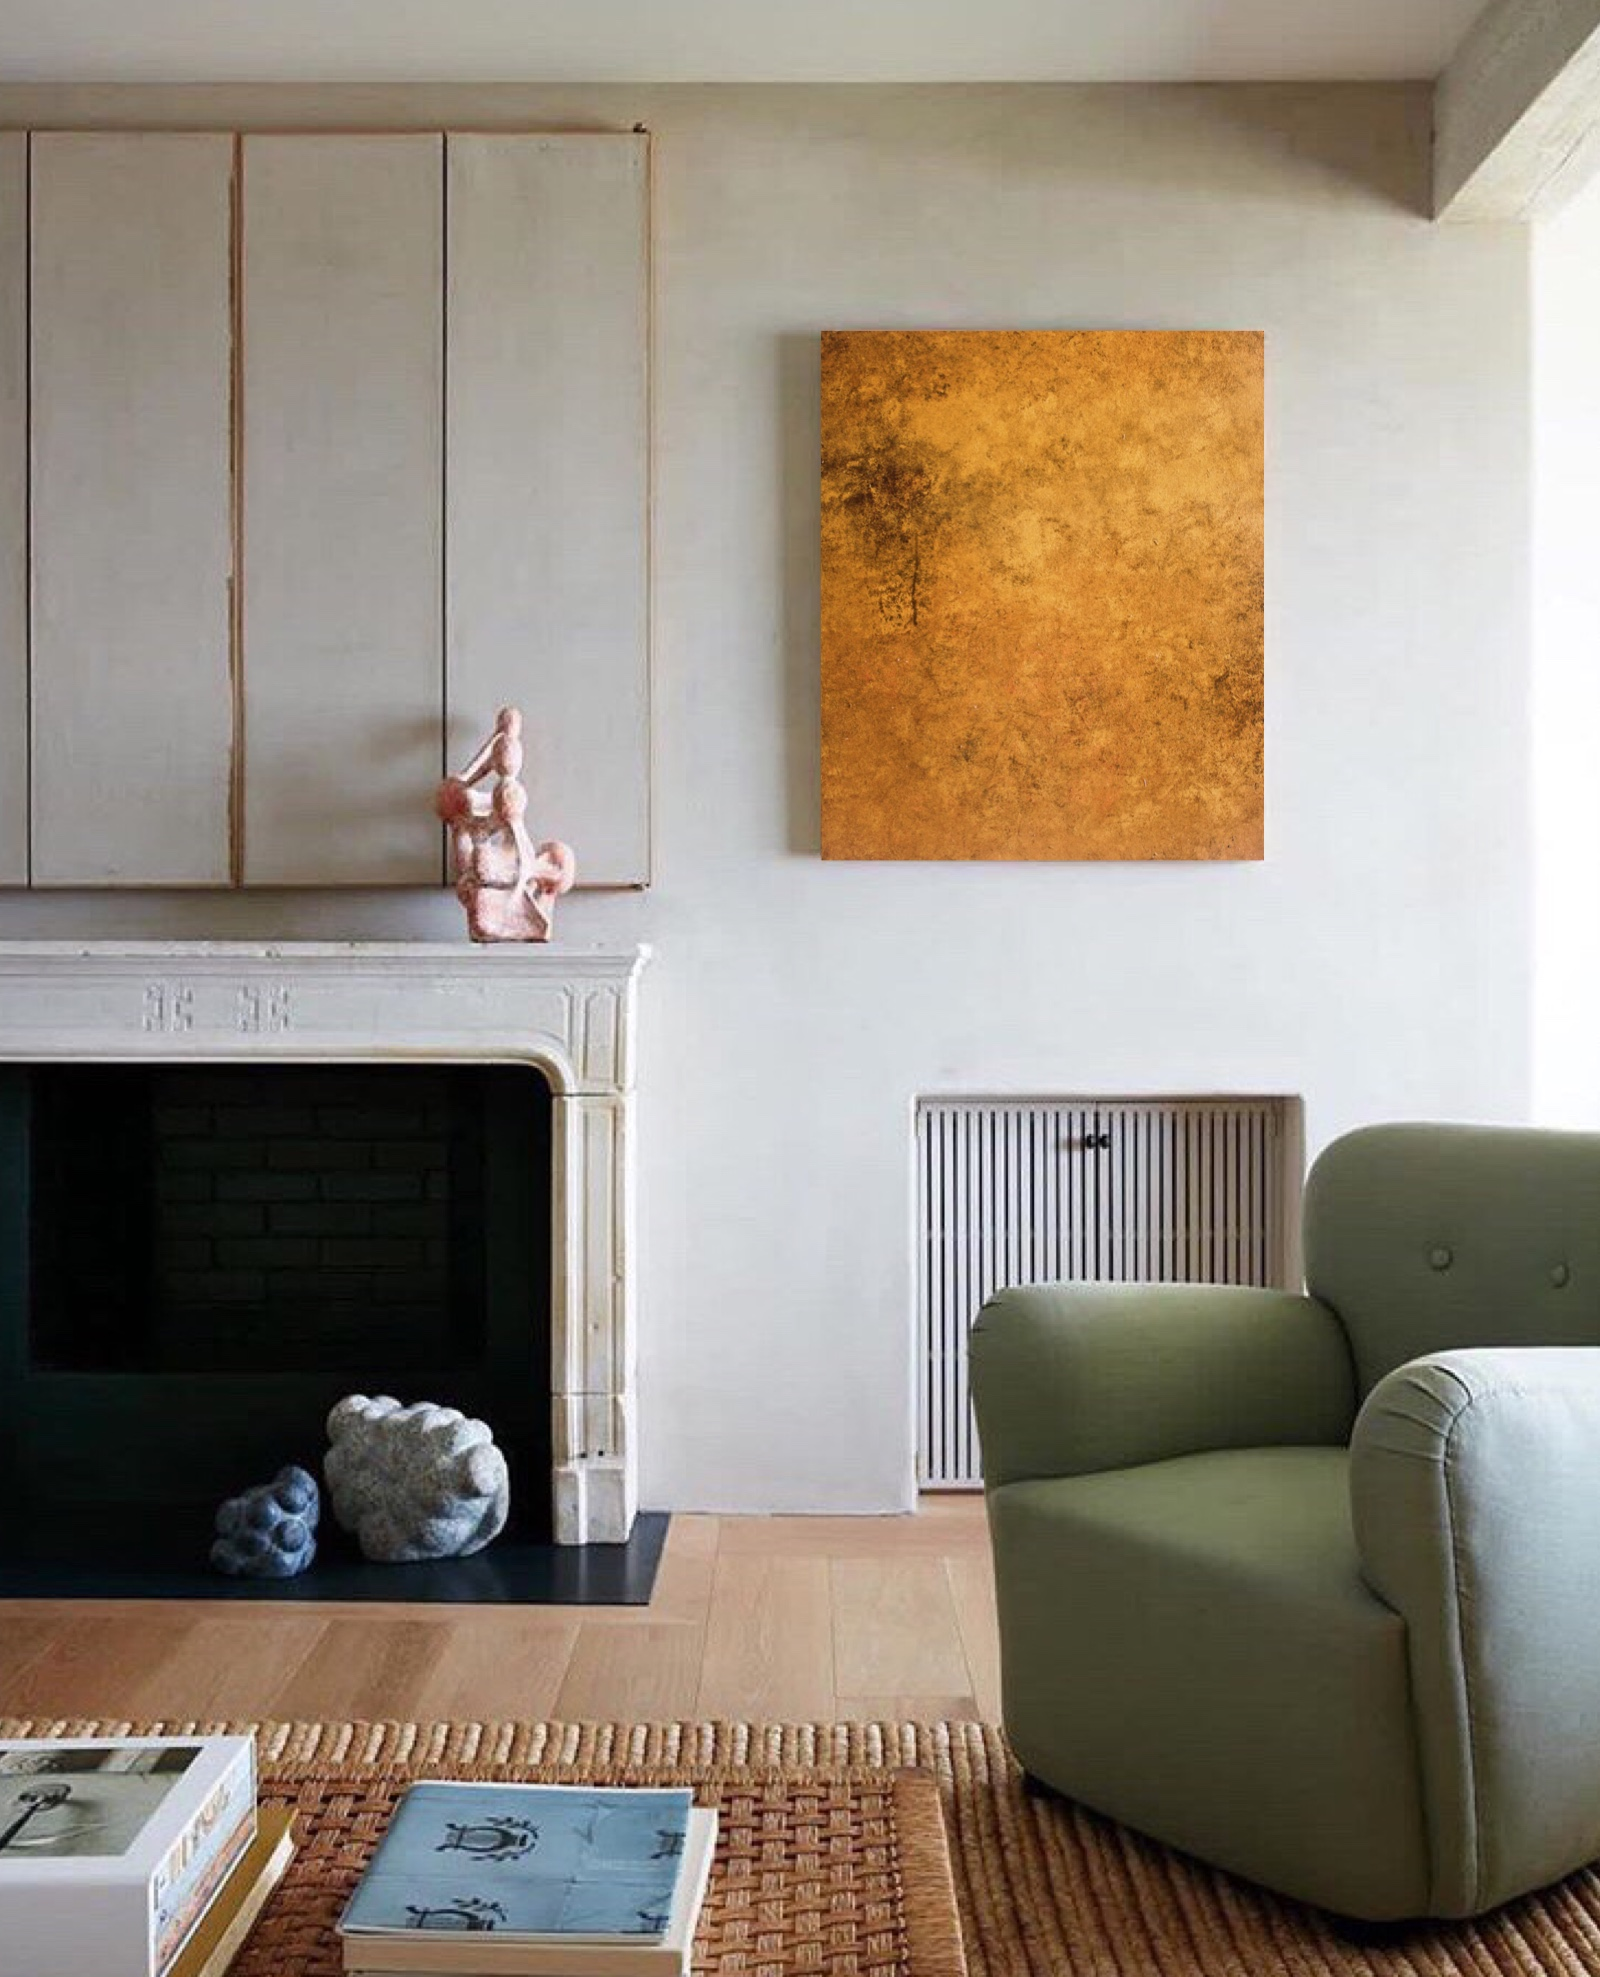 Marine Bonzom - Artiste Peintre Biarritz - Home - Britchka